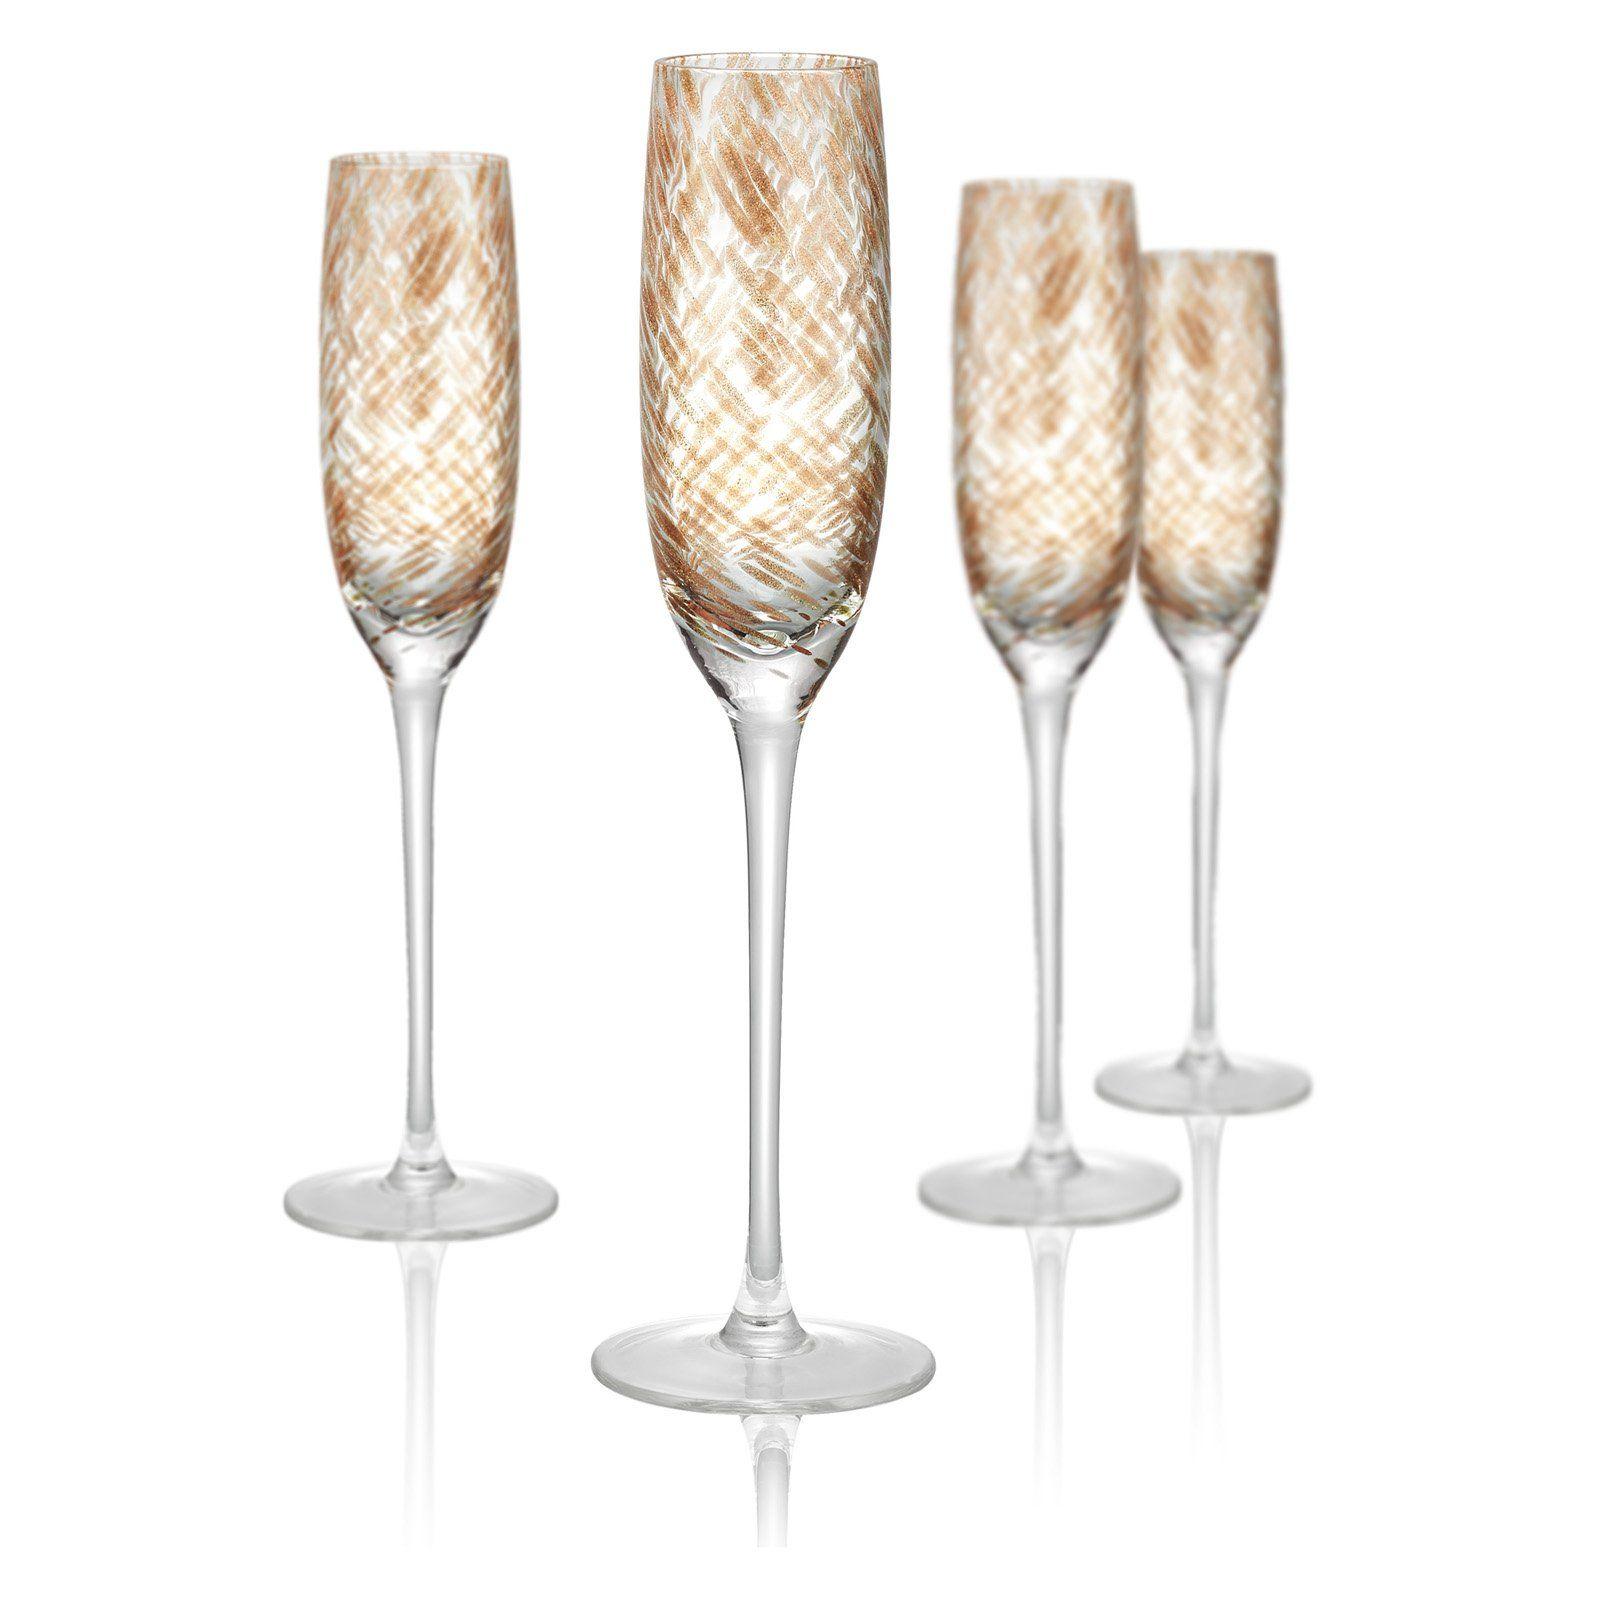 Artland Misty Champagne Flutes Set Of 4 Clear